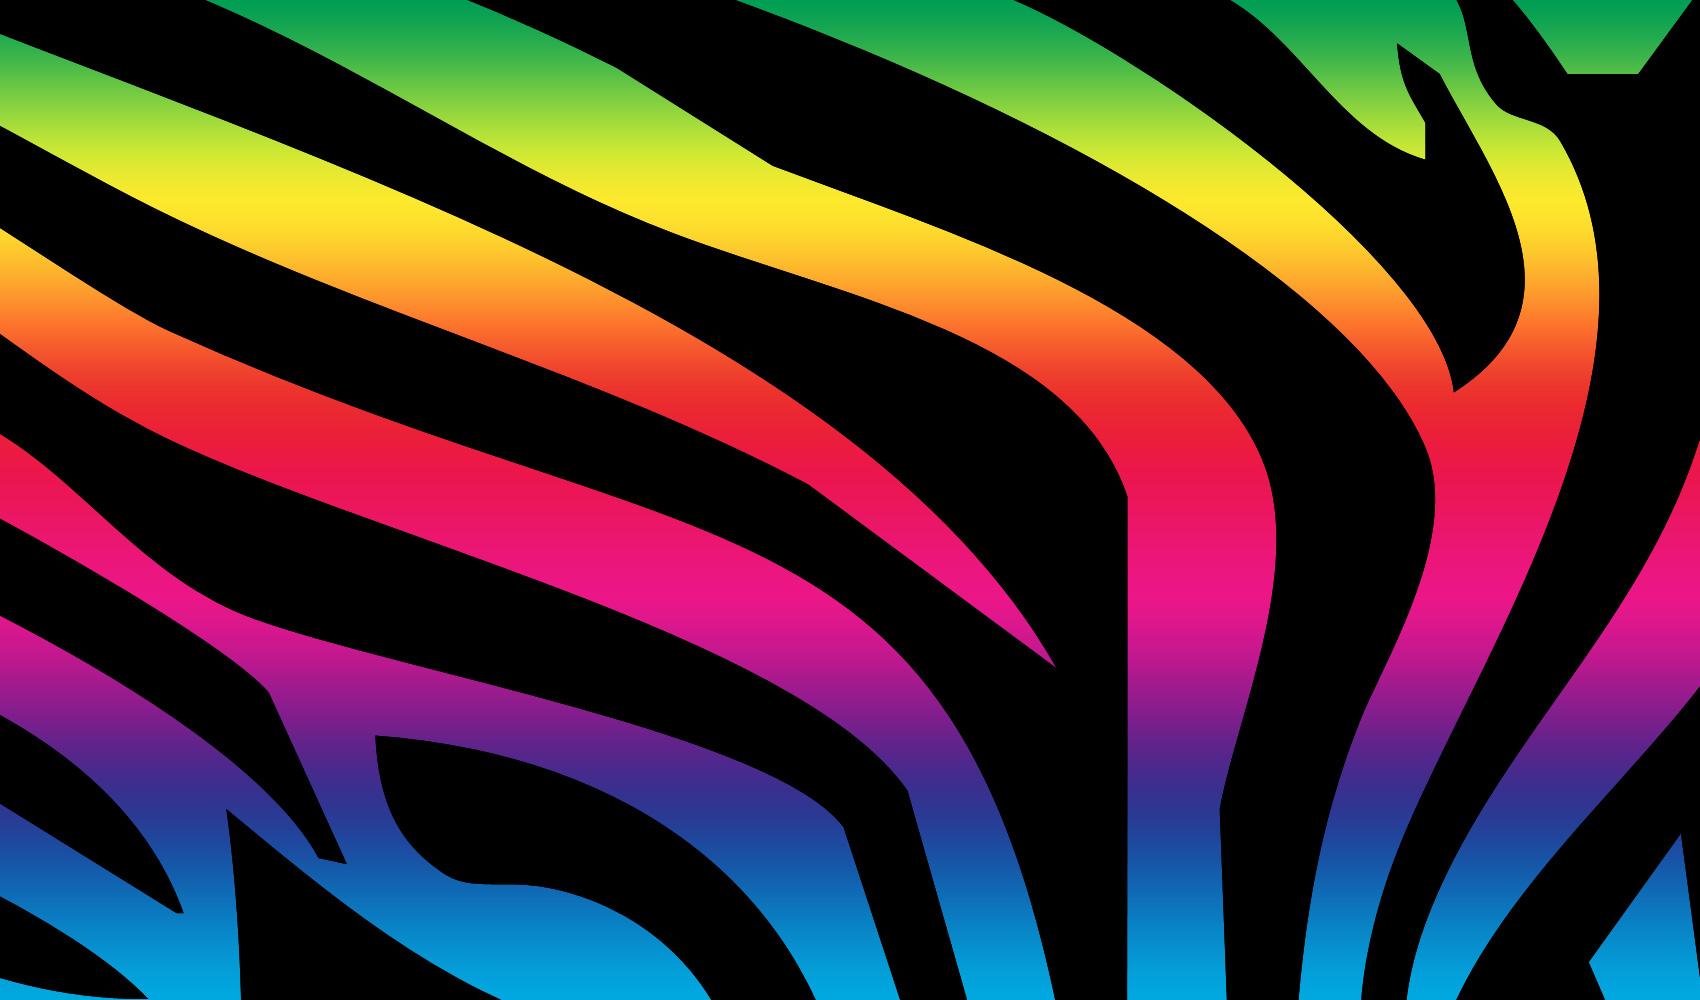 45 Rainbow Zebra Wallpaper On Wallpapersafari